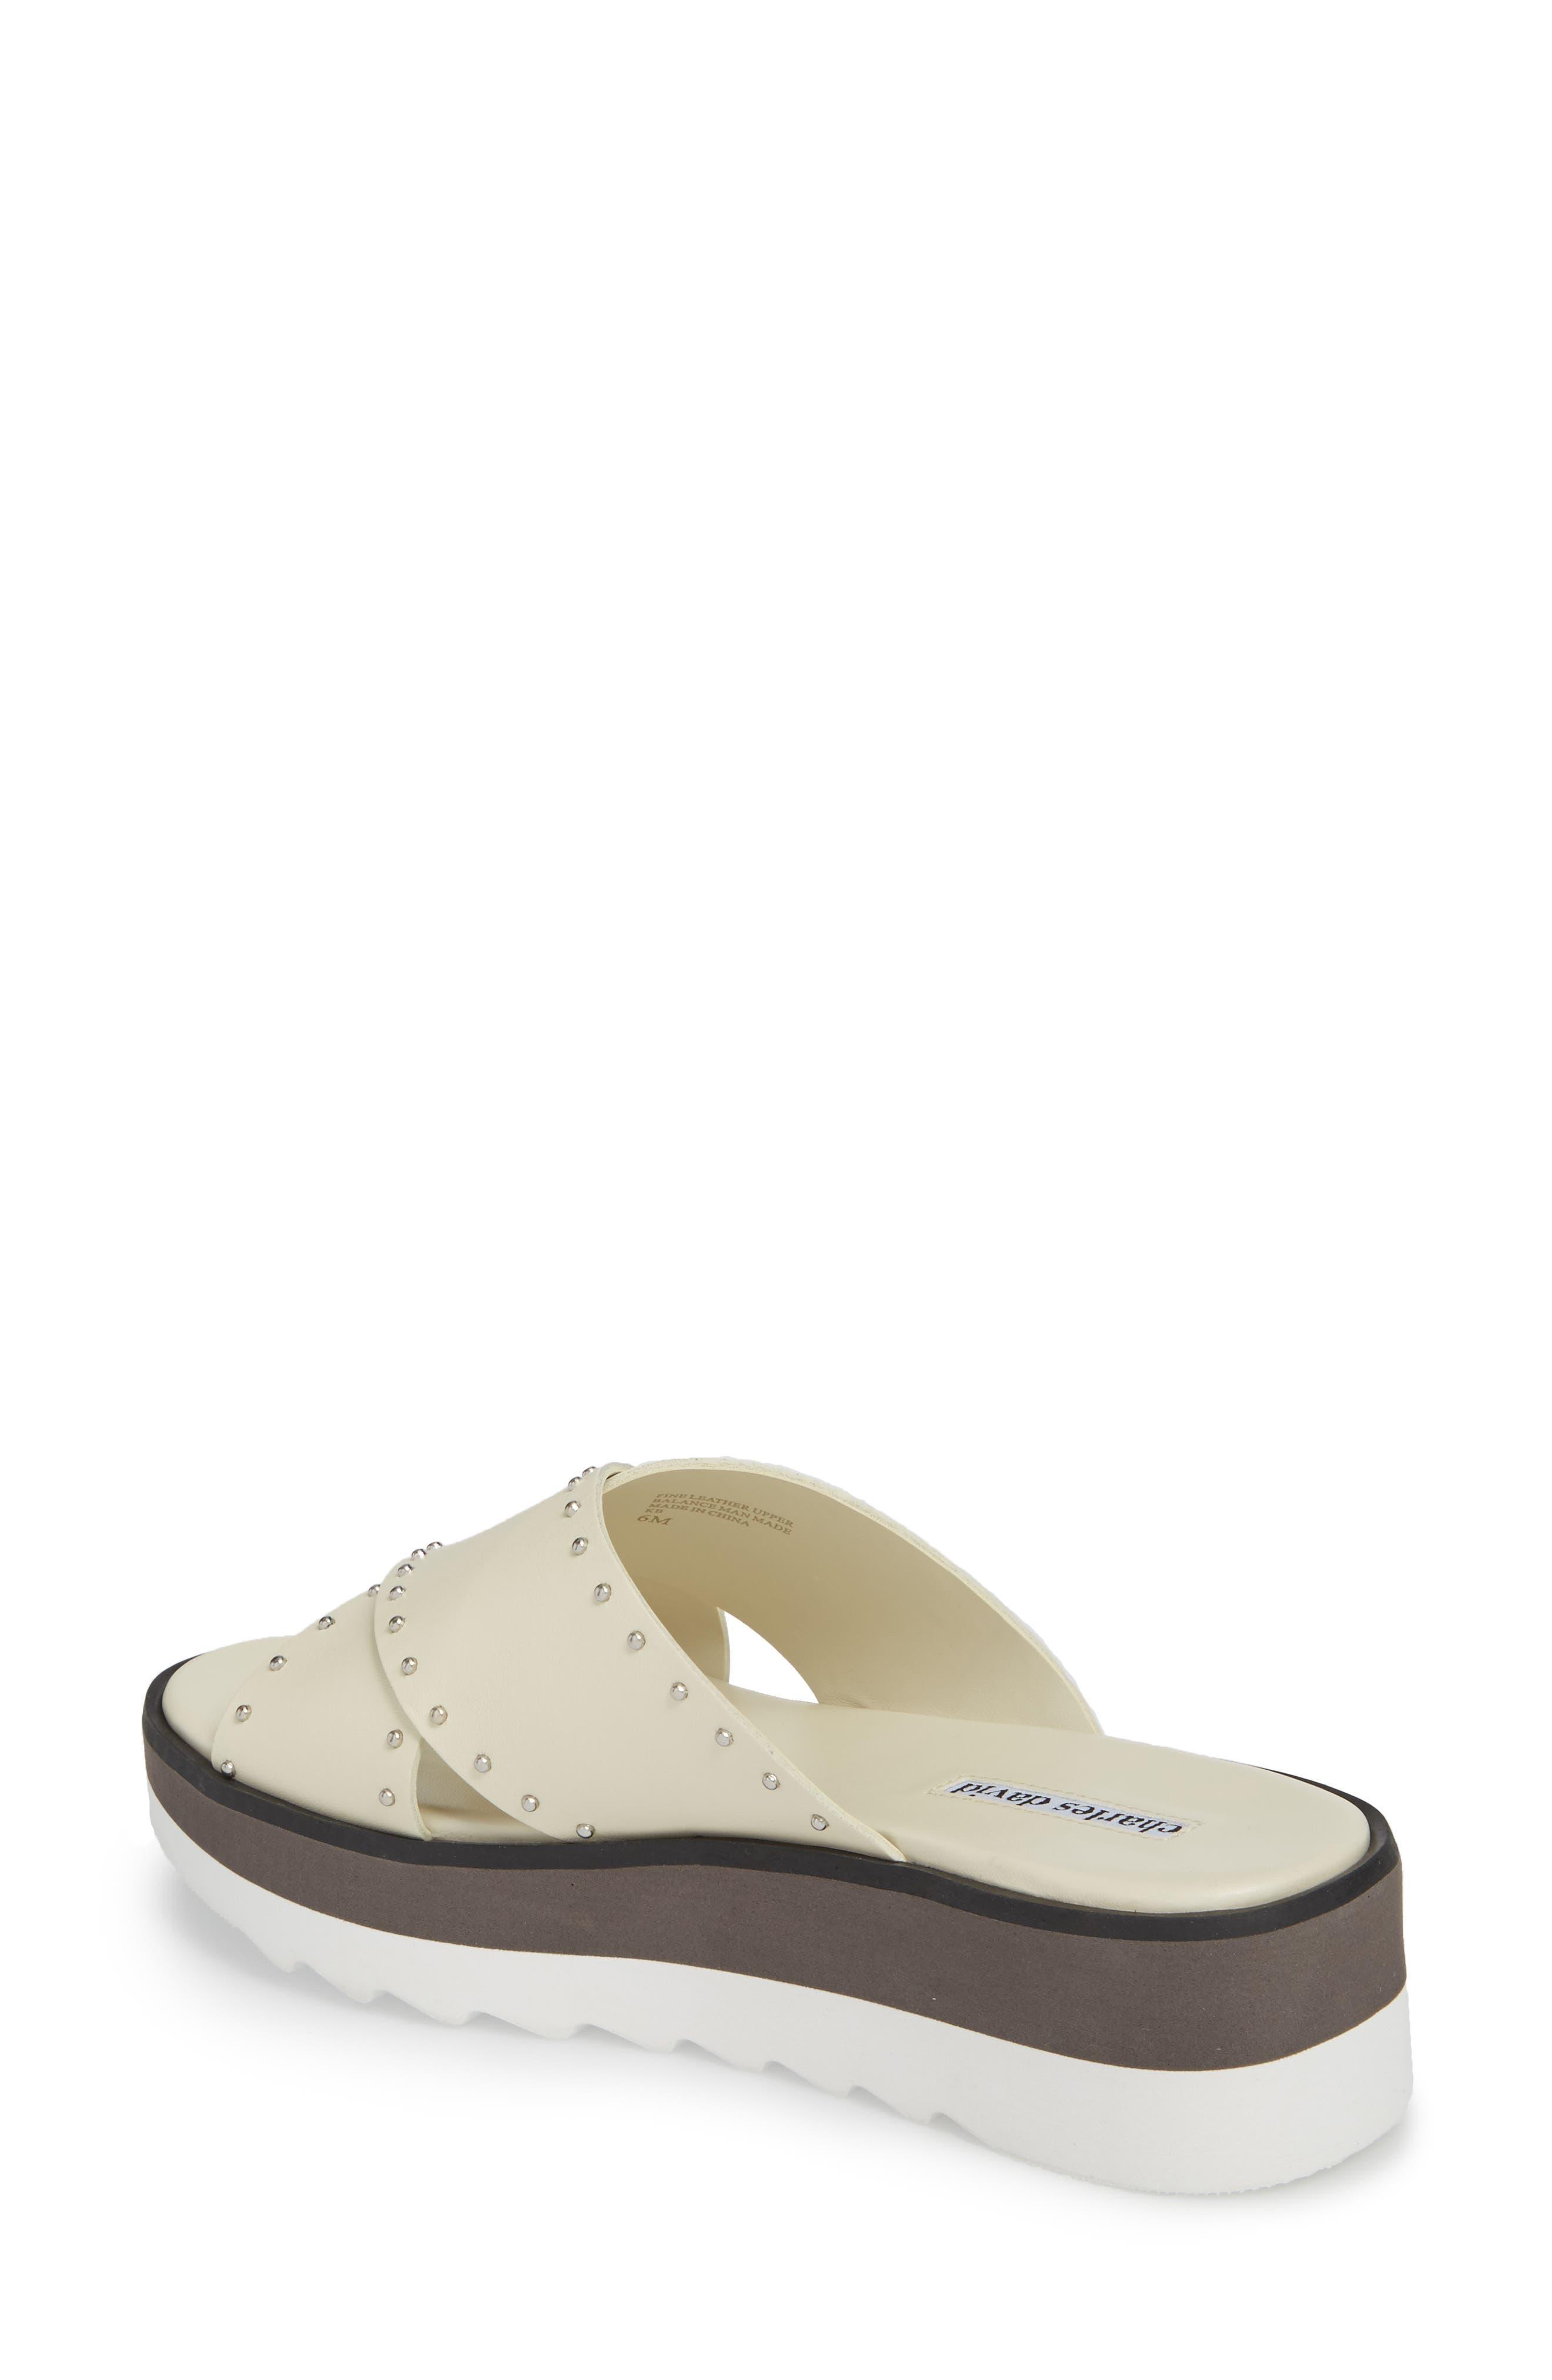 Buxom Sandal,                             Alternate thumbnail 2, color,                             WHITE LEATHER